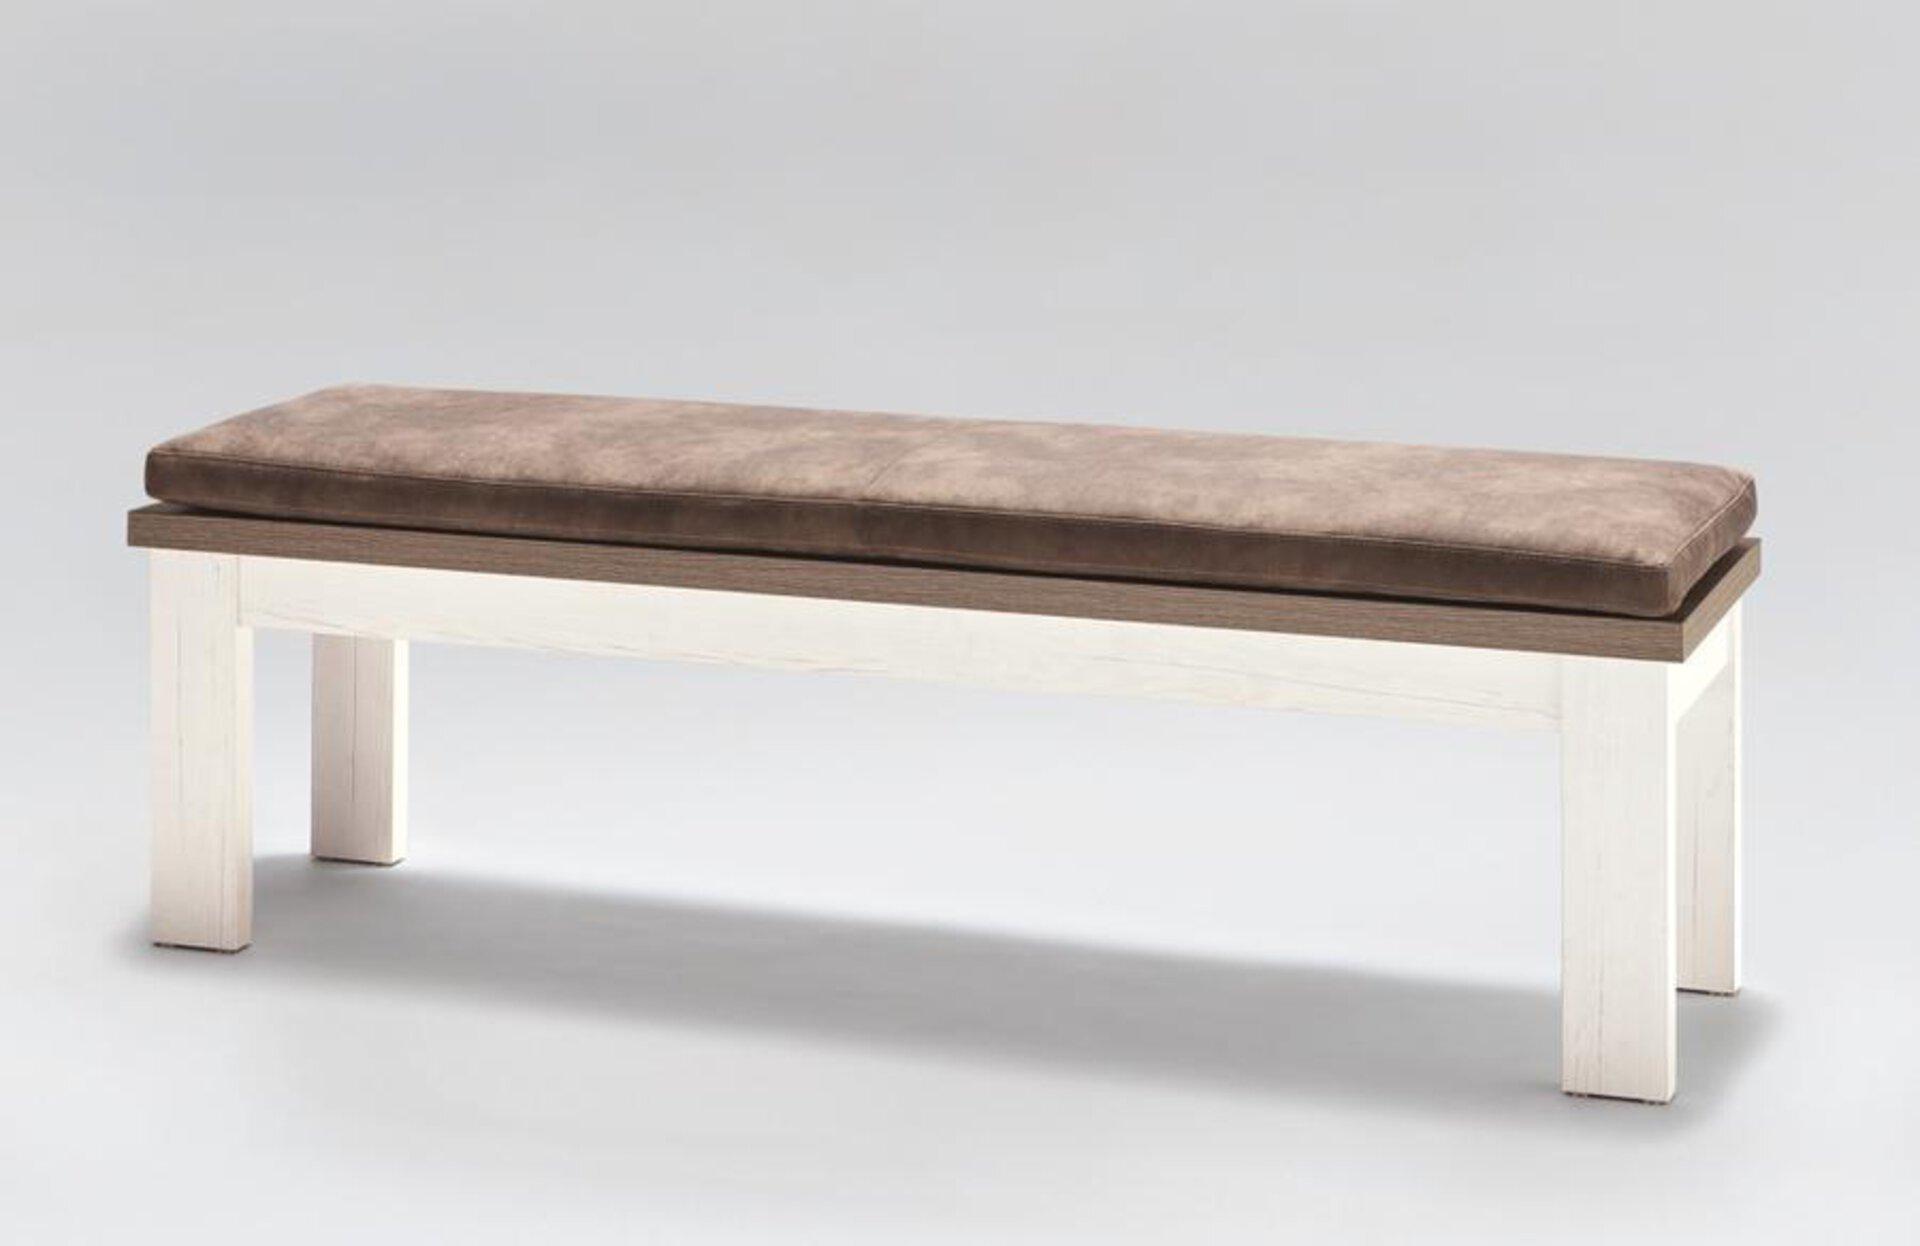 Sitzbank SET ONE set One by Musterring Holzwerkstoff mehrfarbig 43 x 45 x 160 cm